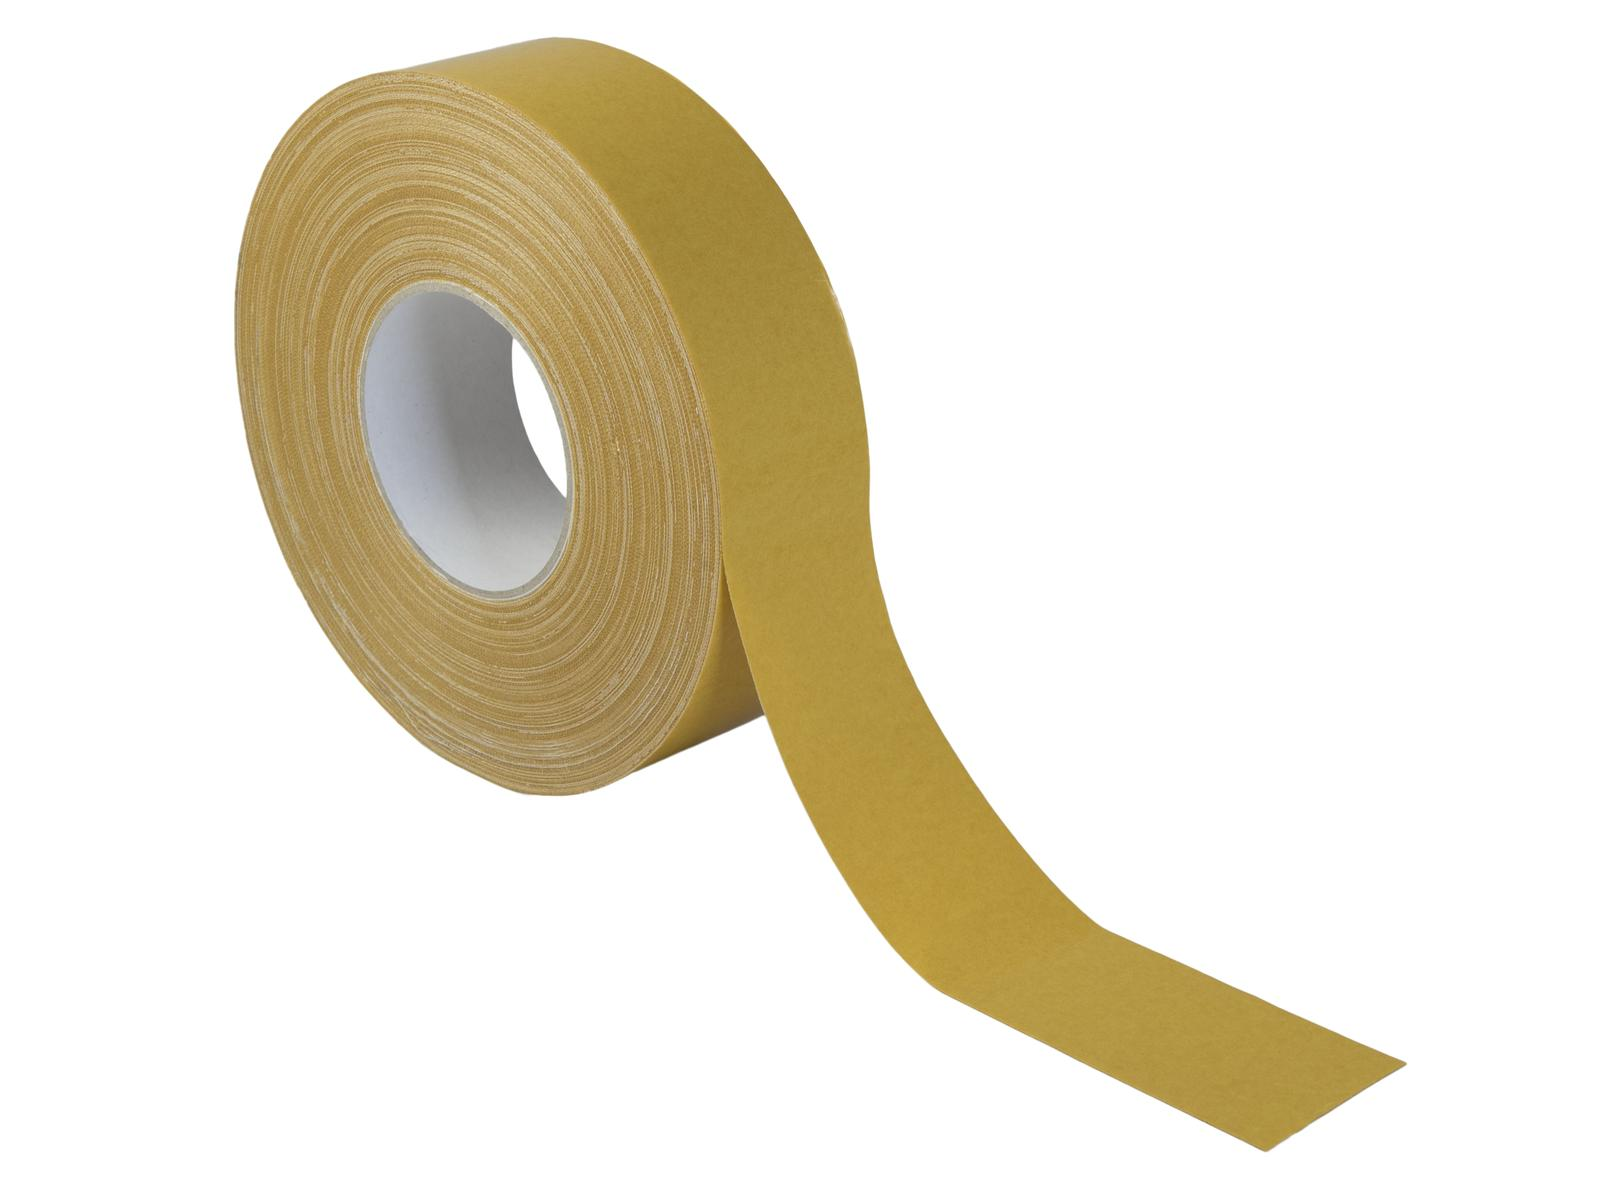 ACCESSORY Teppichverlegeband Gewebe 50mmx50m